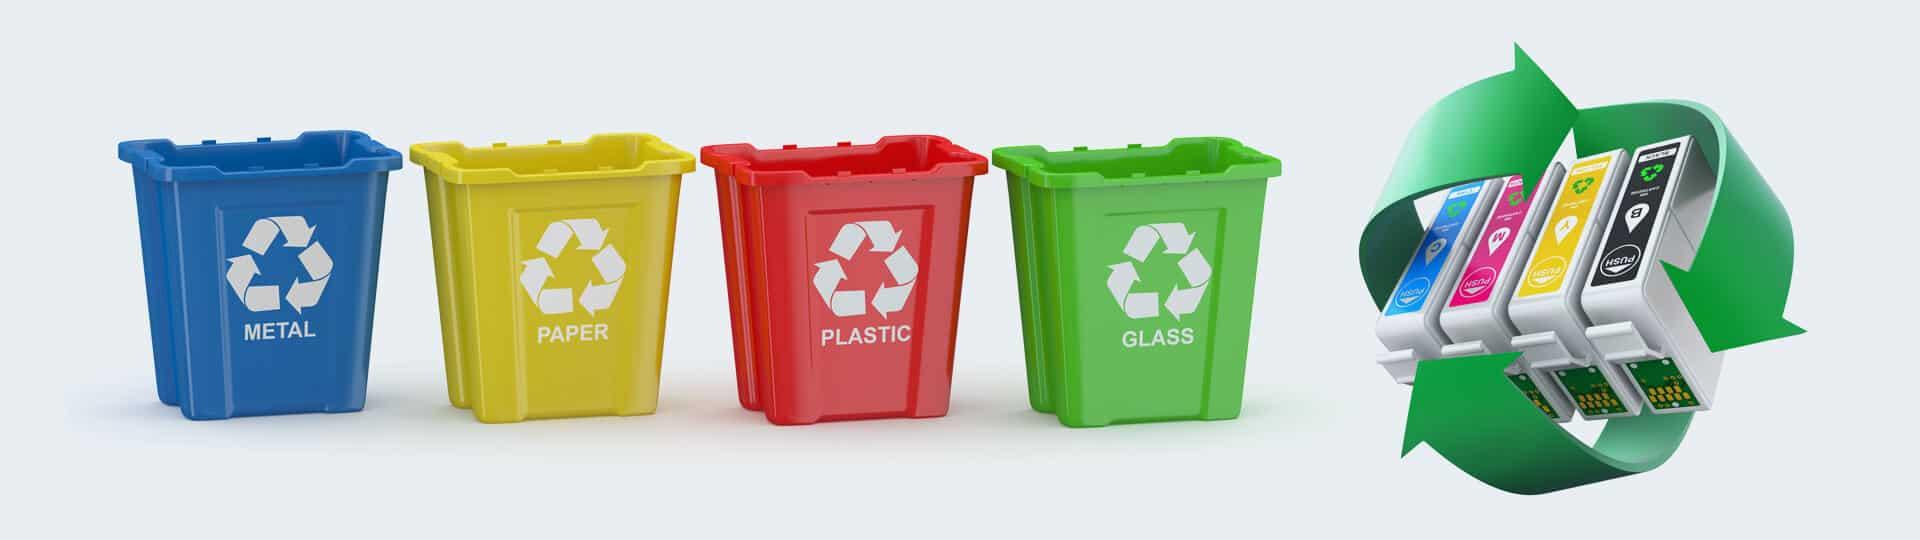 toner recycling program, My Office Etc.